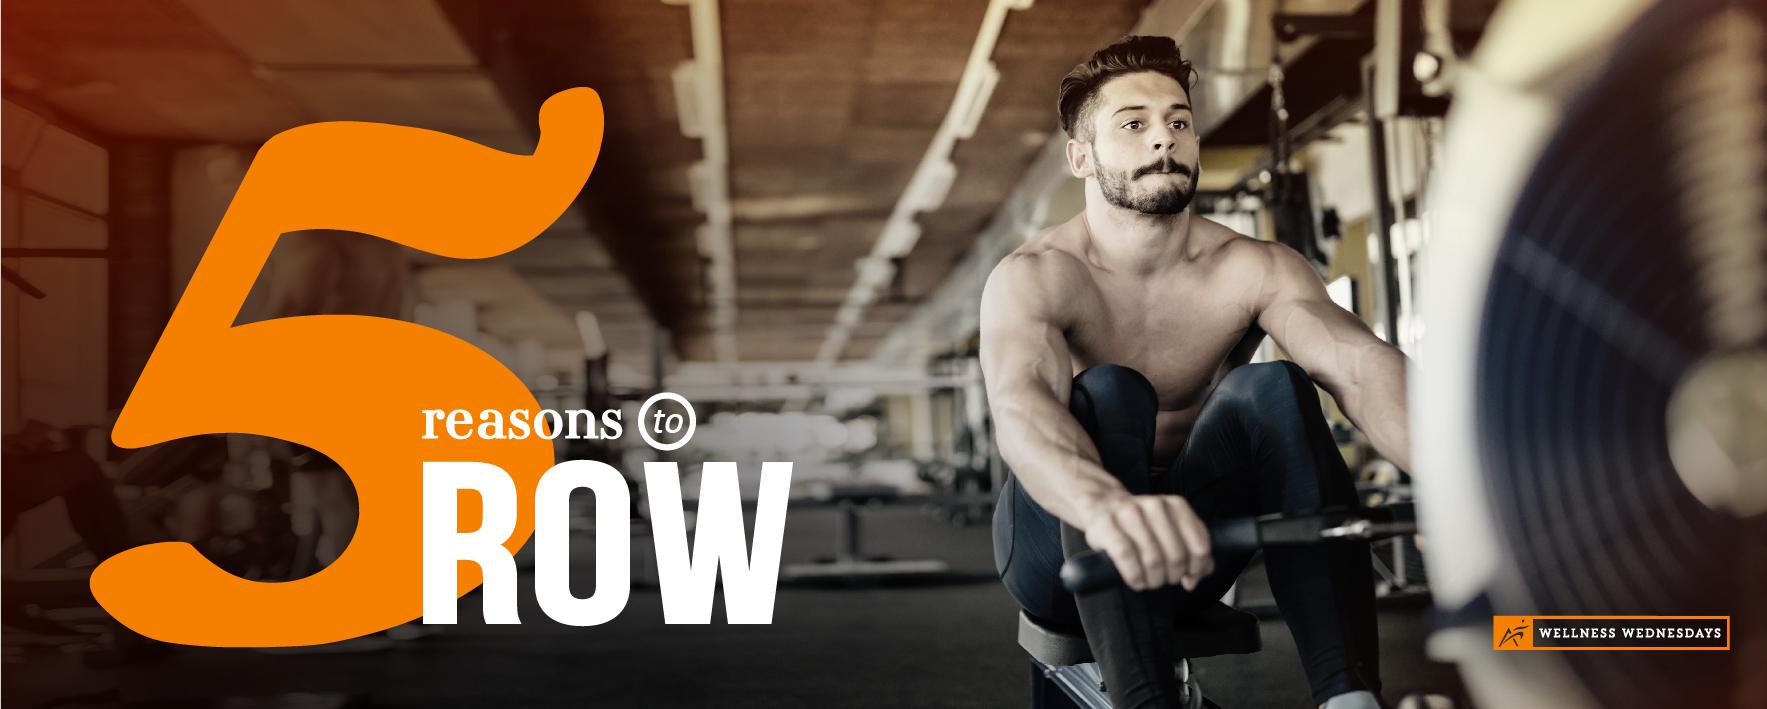 Five Reasons to Row